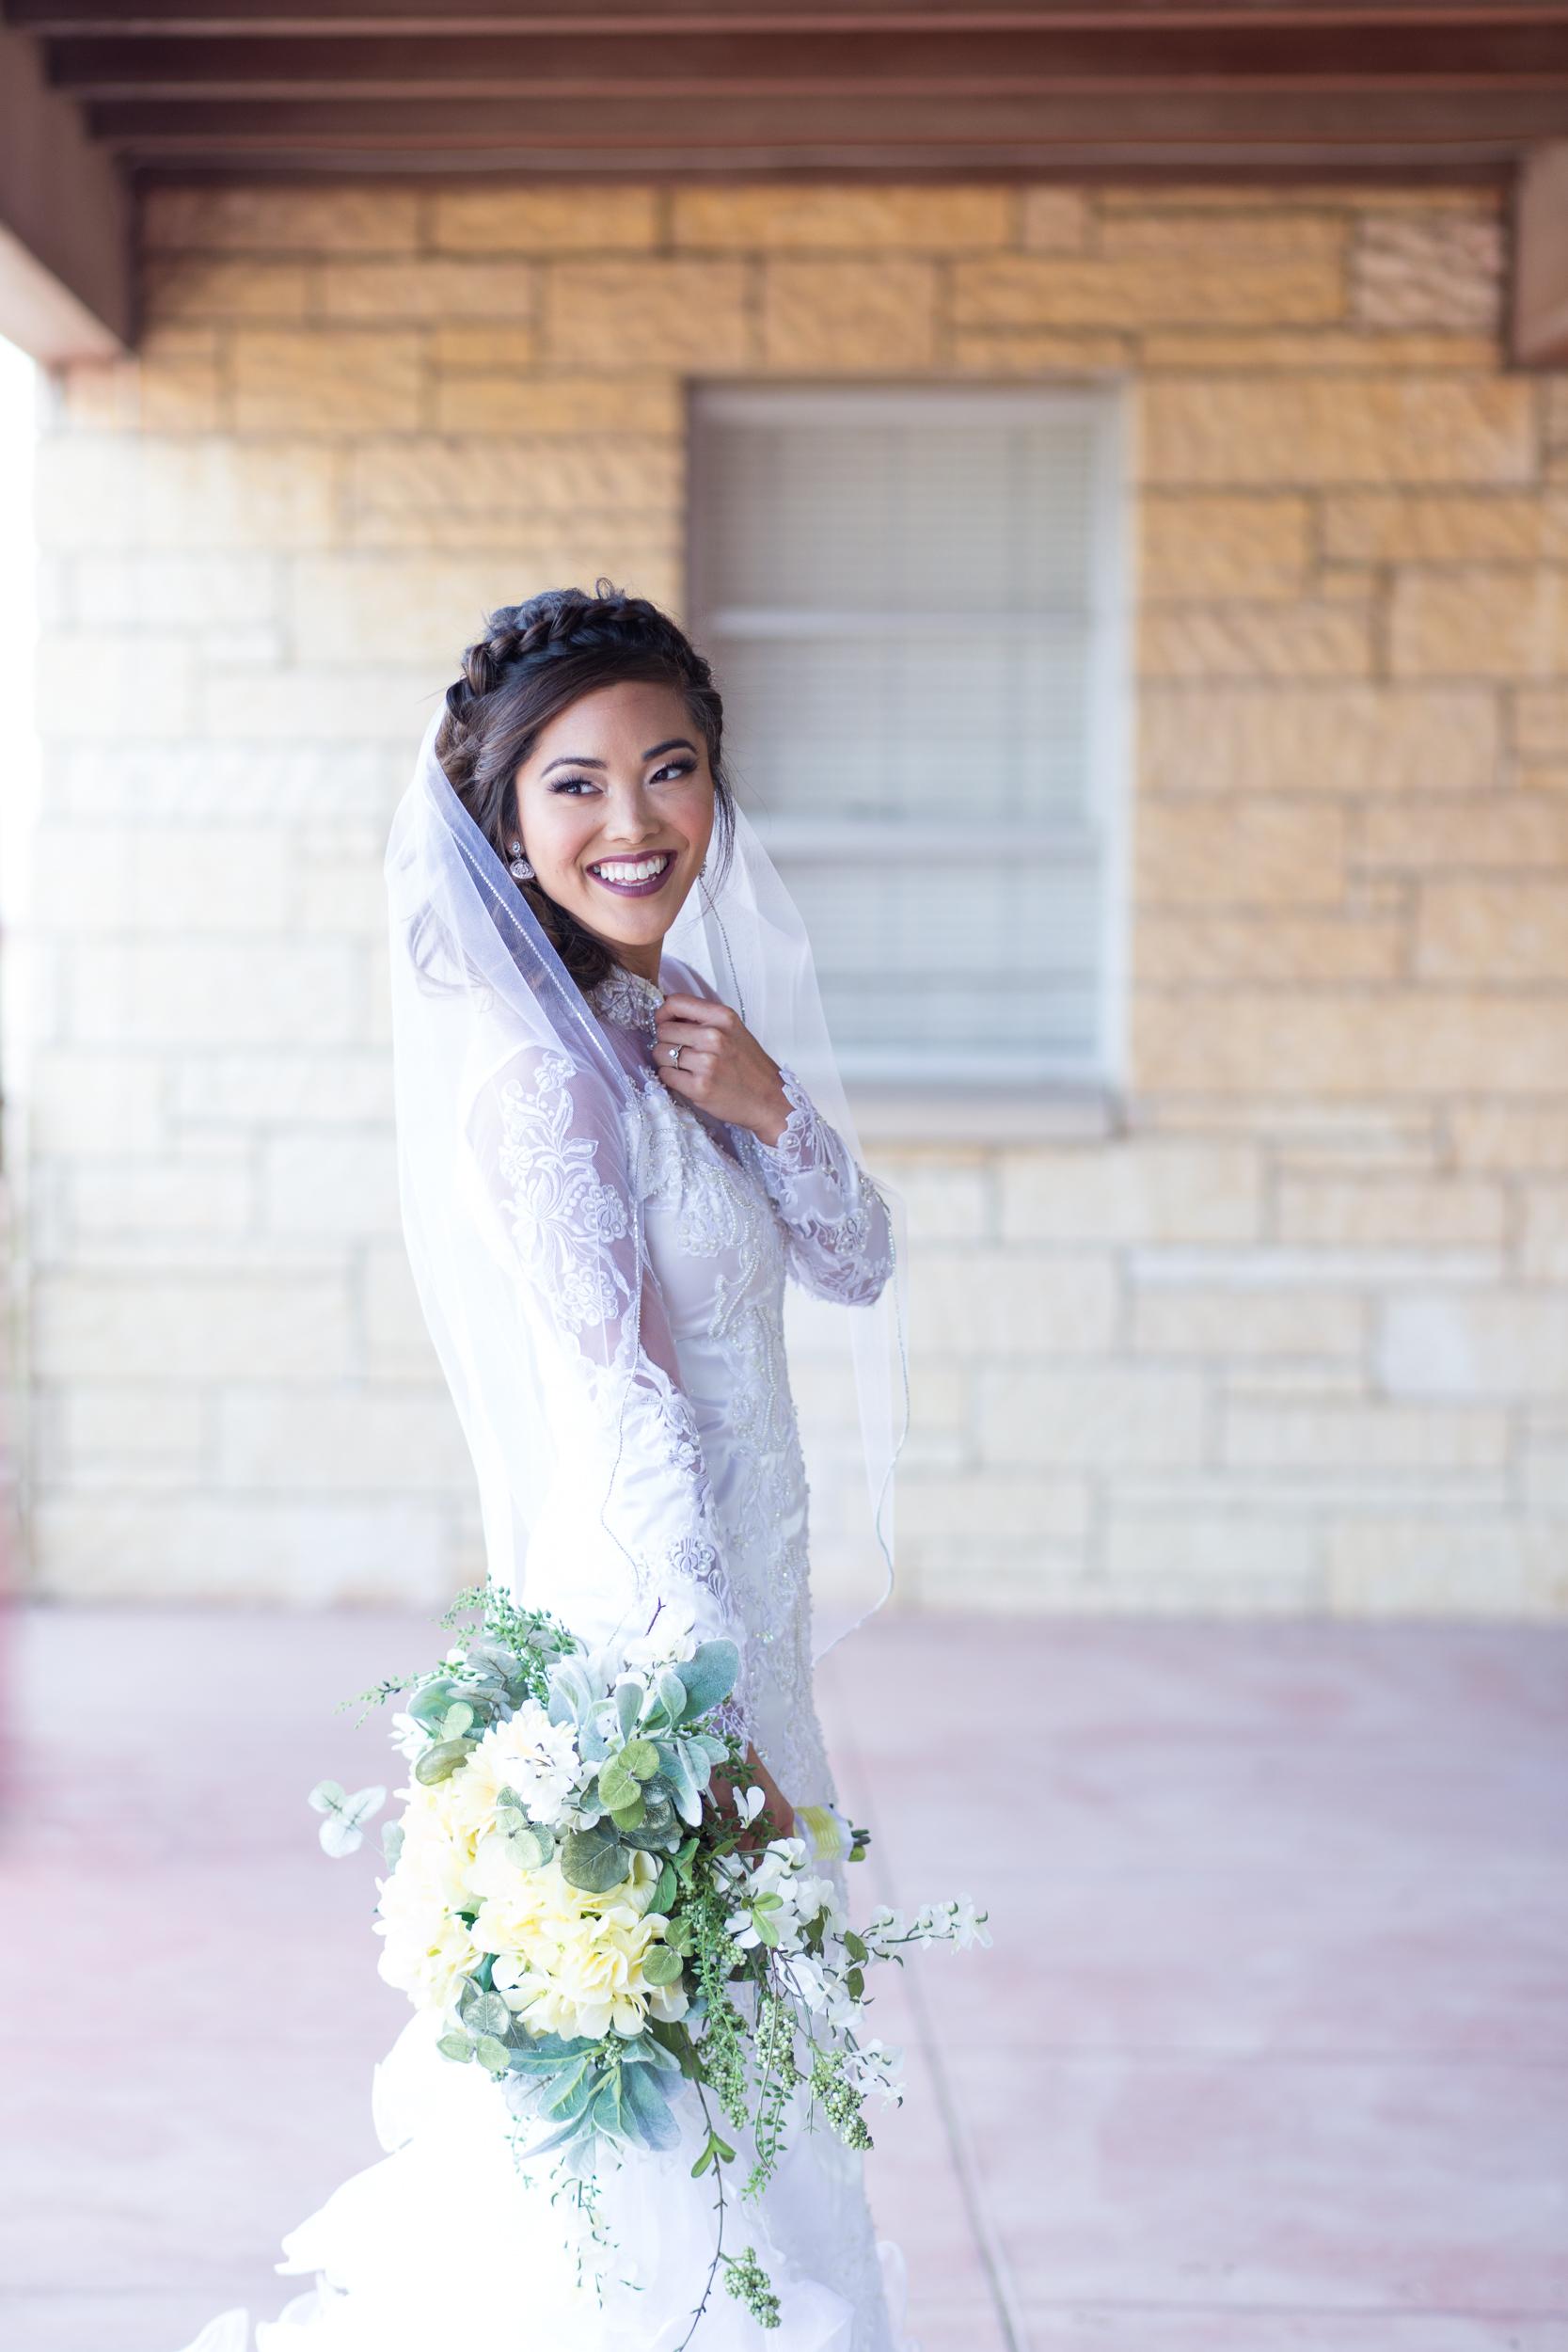 hall_wedding blog_kelsie hendricks photography_odessa_ west texas-31.jpg